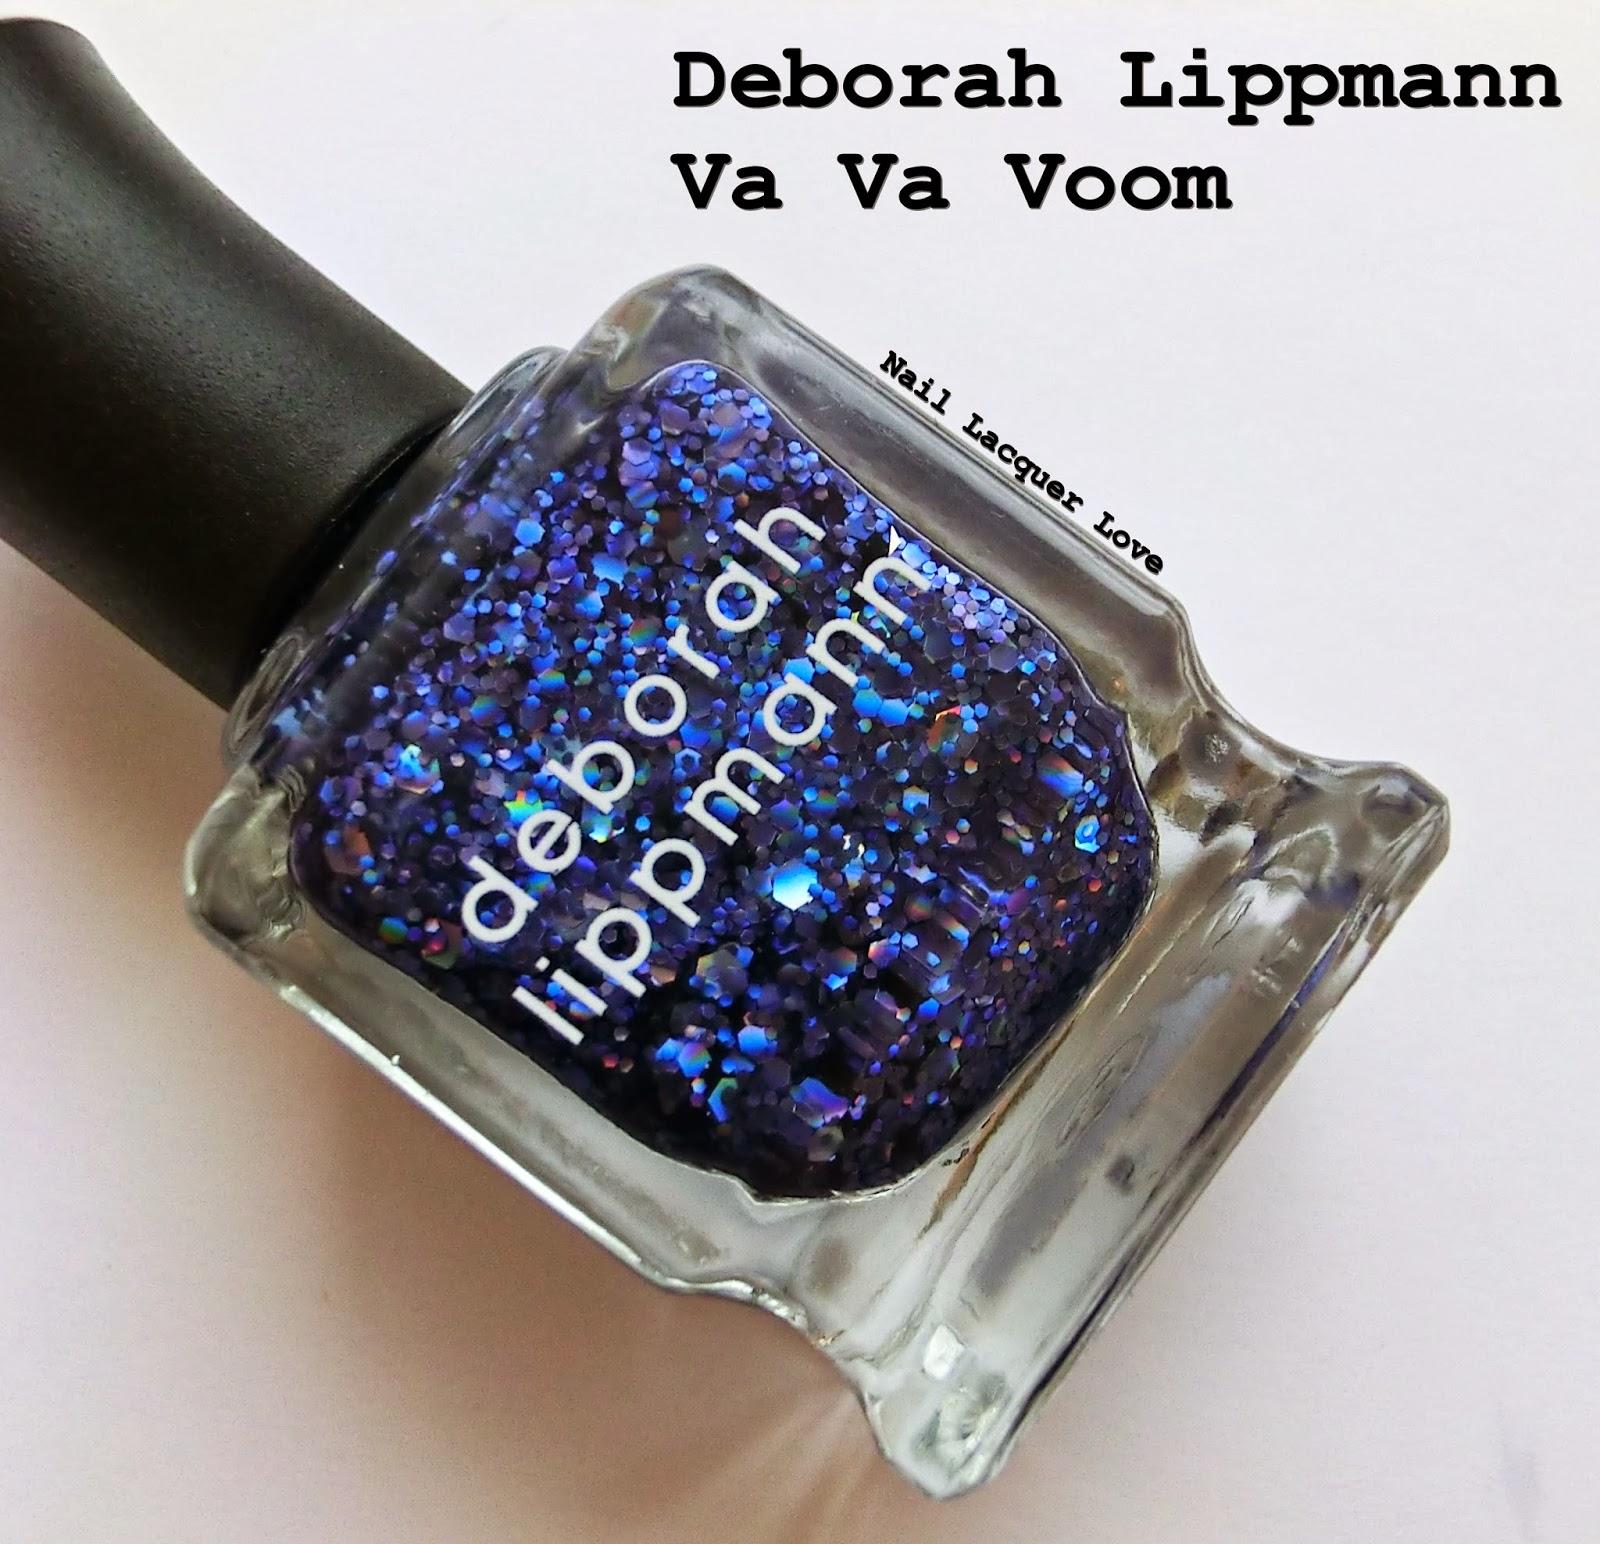 nail lacquer love deborah lippmann va va voom. Black Bedroom Furniture Sets. Home Design Ideas